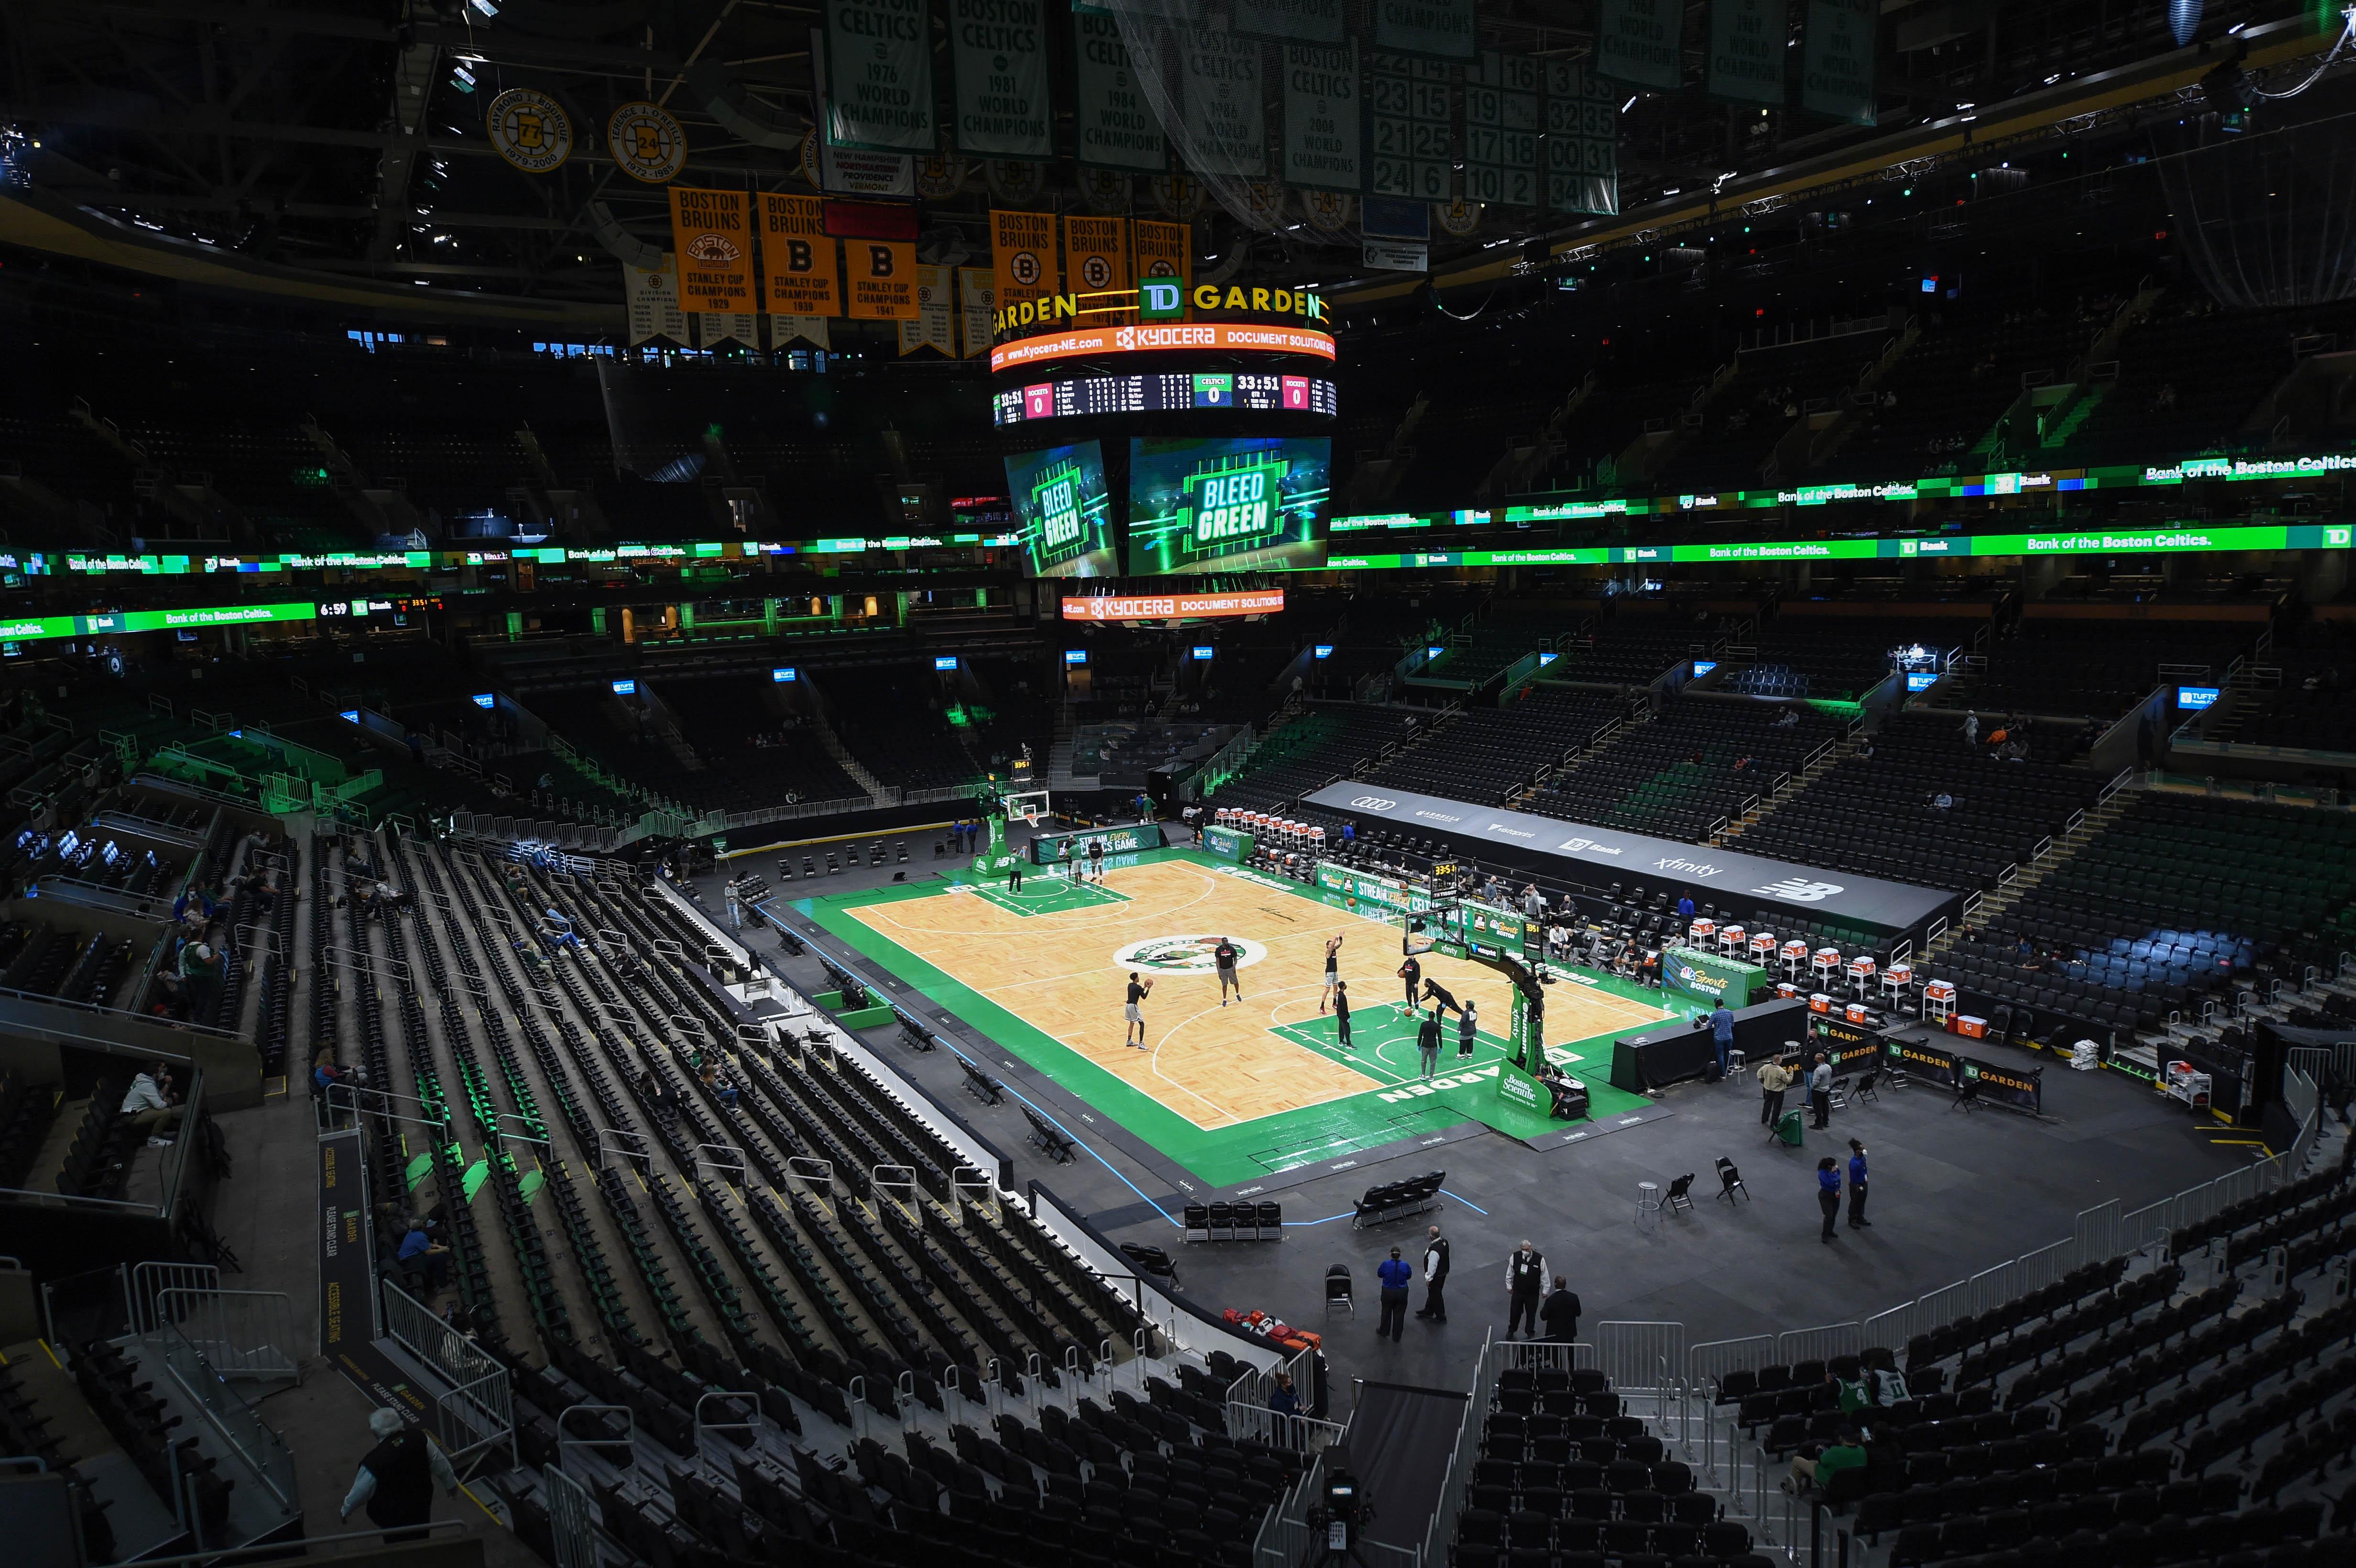 Apr 2, 2021; Boston, Massachusetts, USA;  Members of the Houston Rockets warmup prior to a game against the Boston Celtics at TD Garden. Mandatory Credit: Bob DeChiara-USA TODAY Sports